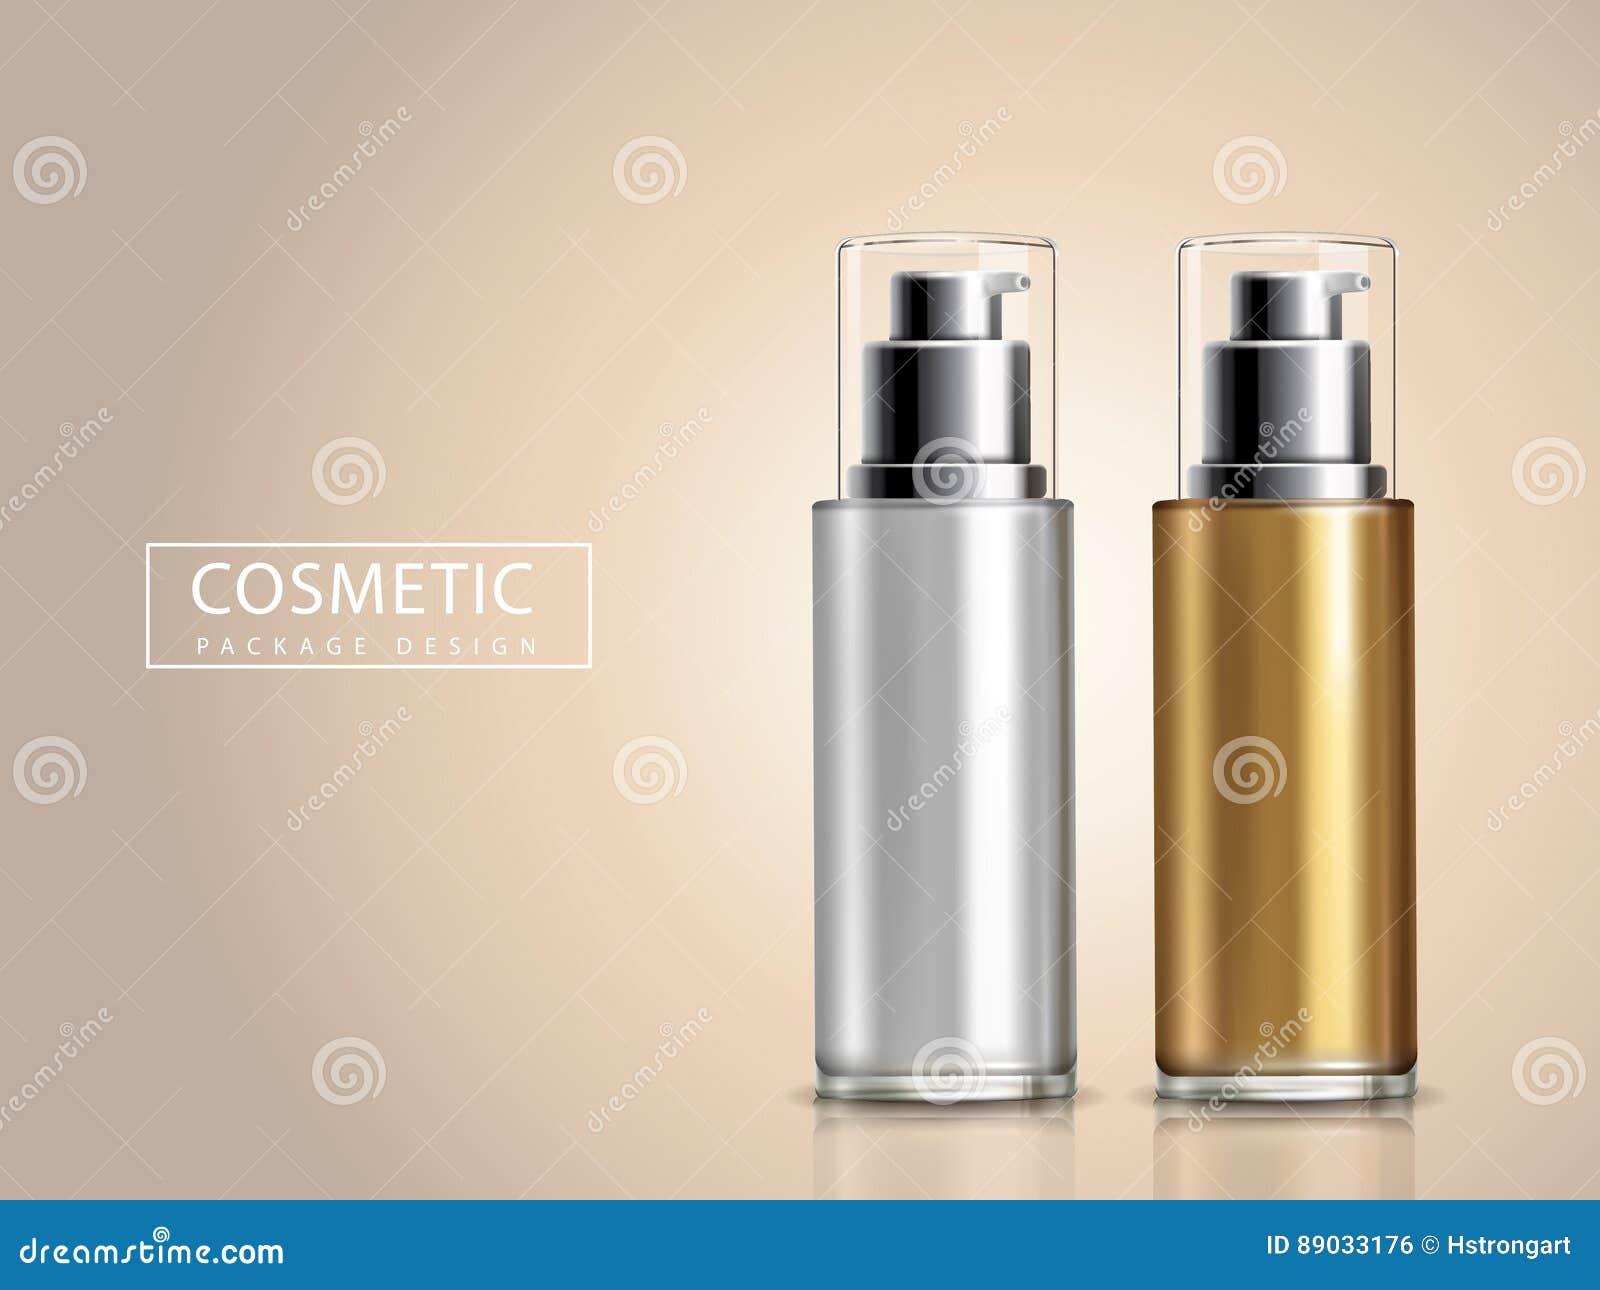 Bicolor cosmetic bottles